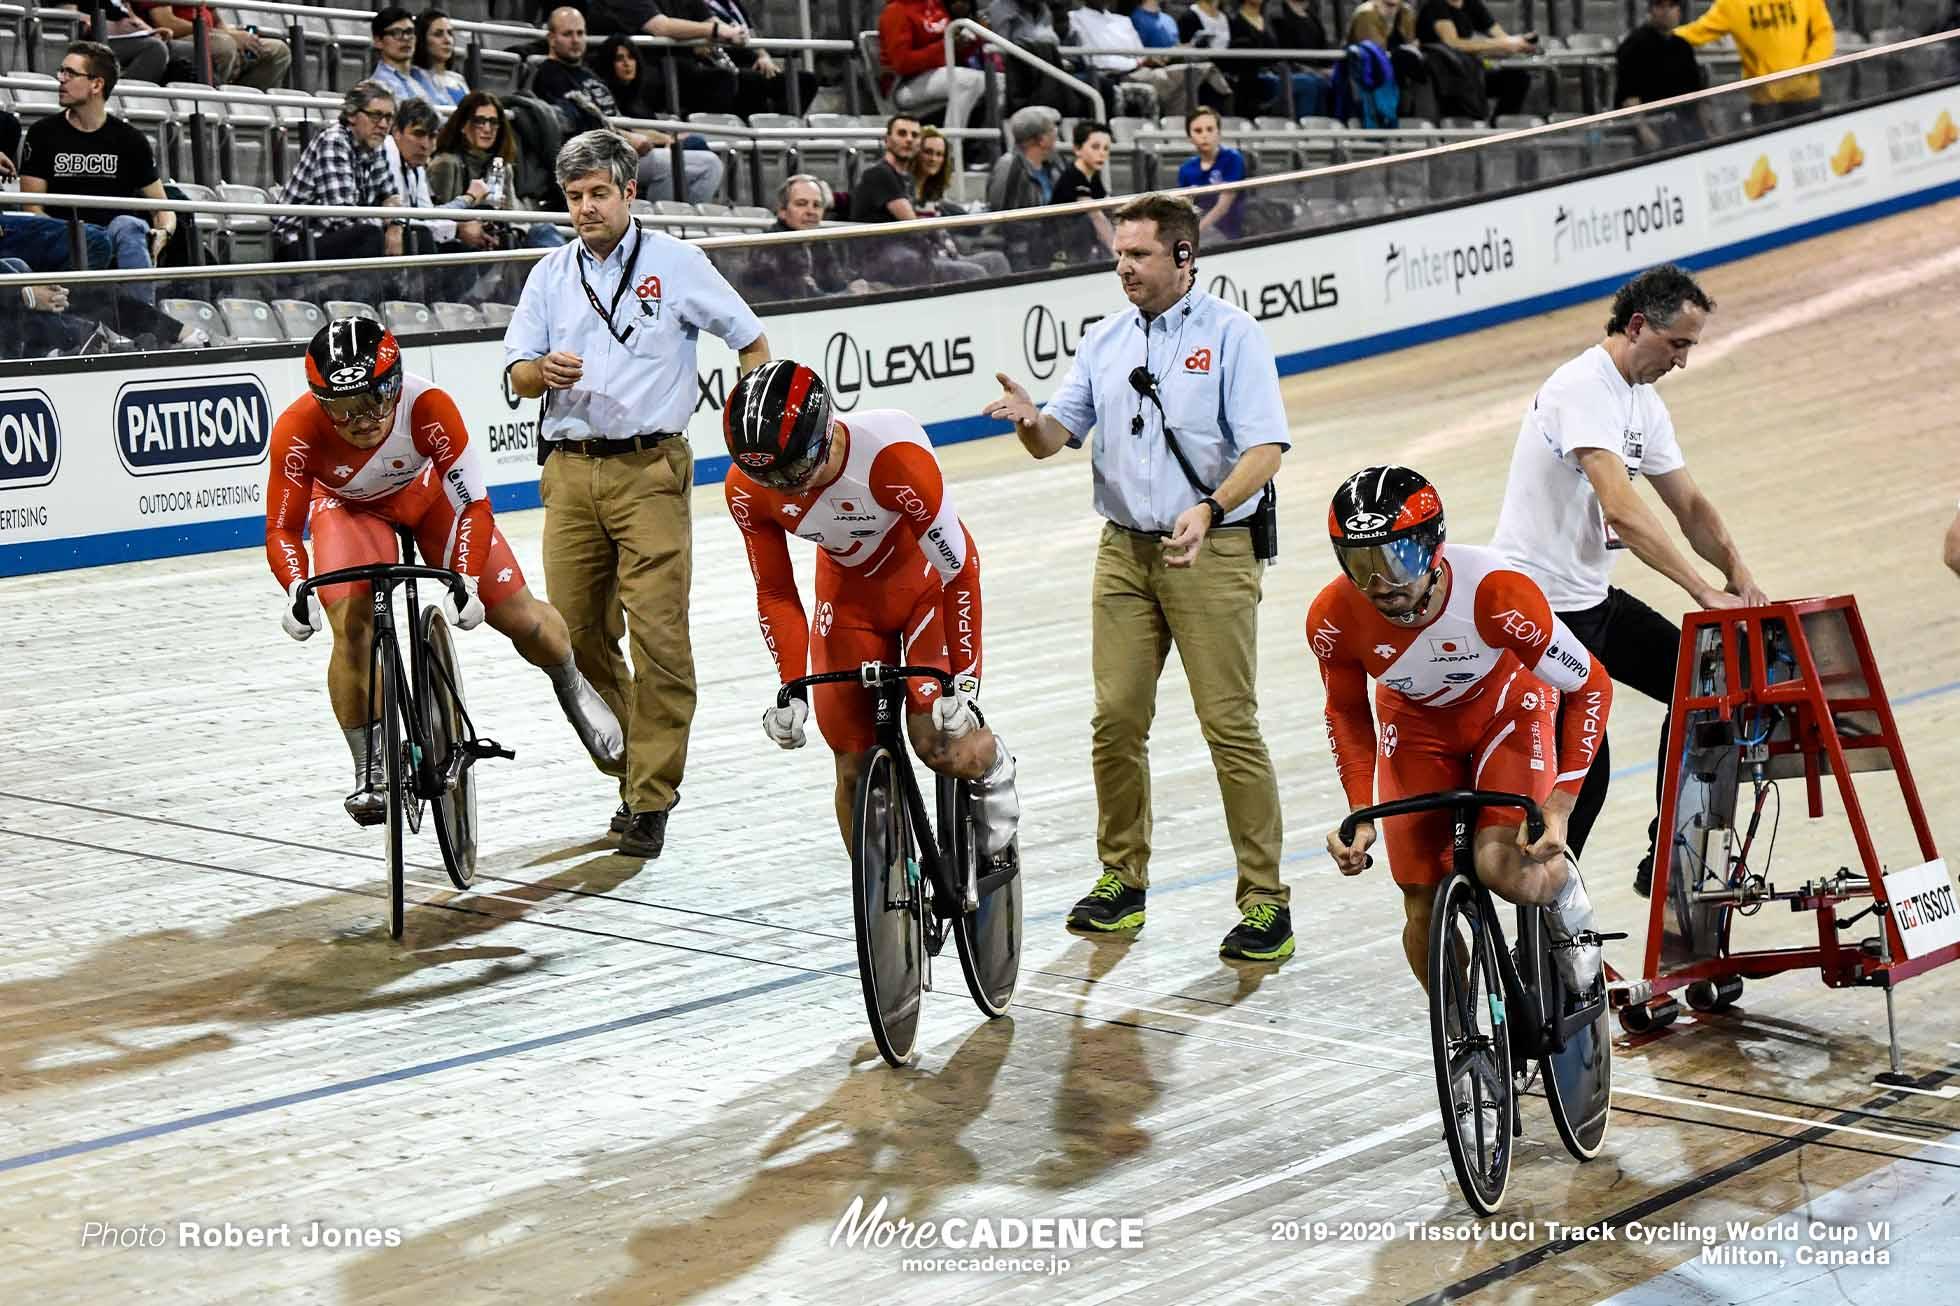 Men's Team Sprint / TISSOT UCI TRACK CYCLING WORLD CUP VI, Milton, Canada, 雨谷一樹, 小原佑太, 松井宏佑